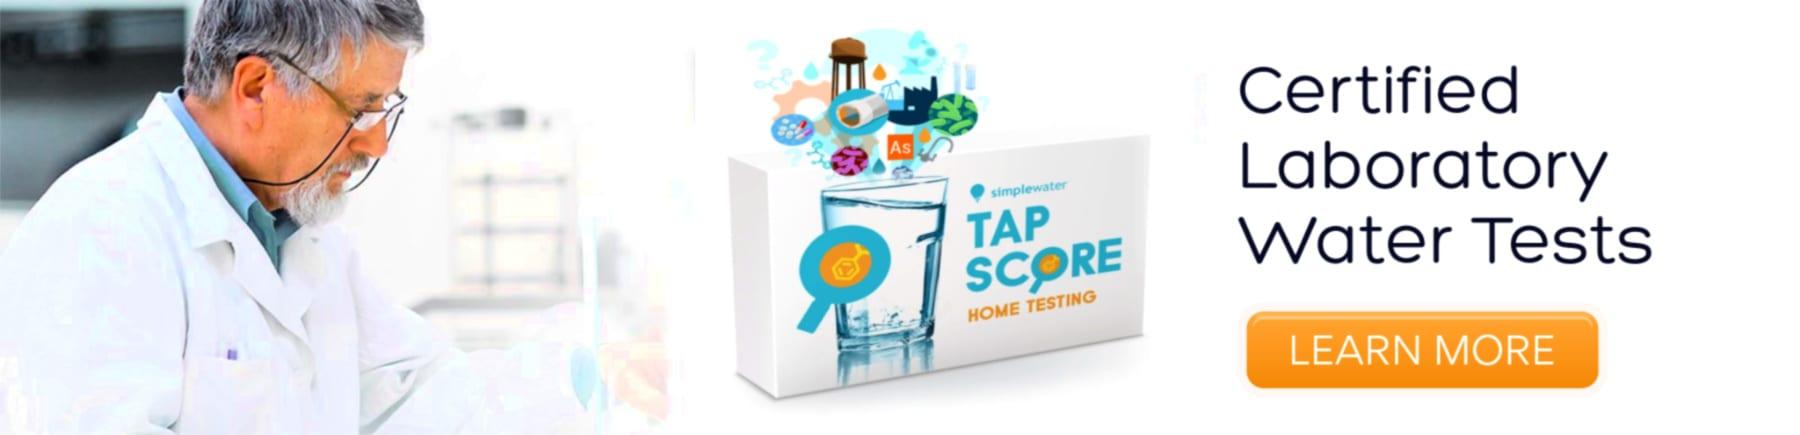 Purchase Chilliwack Water Test Kits Online